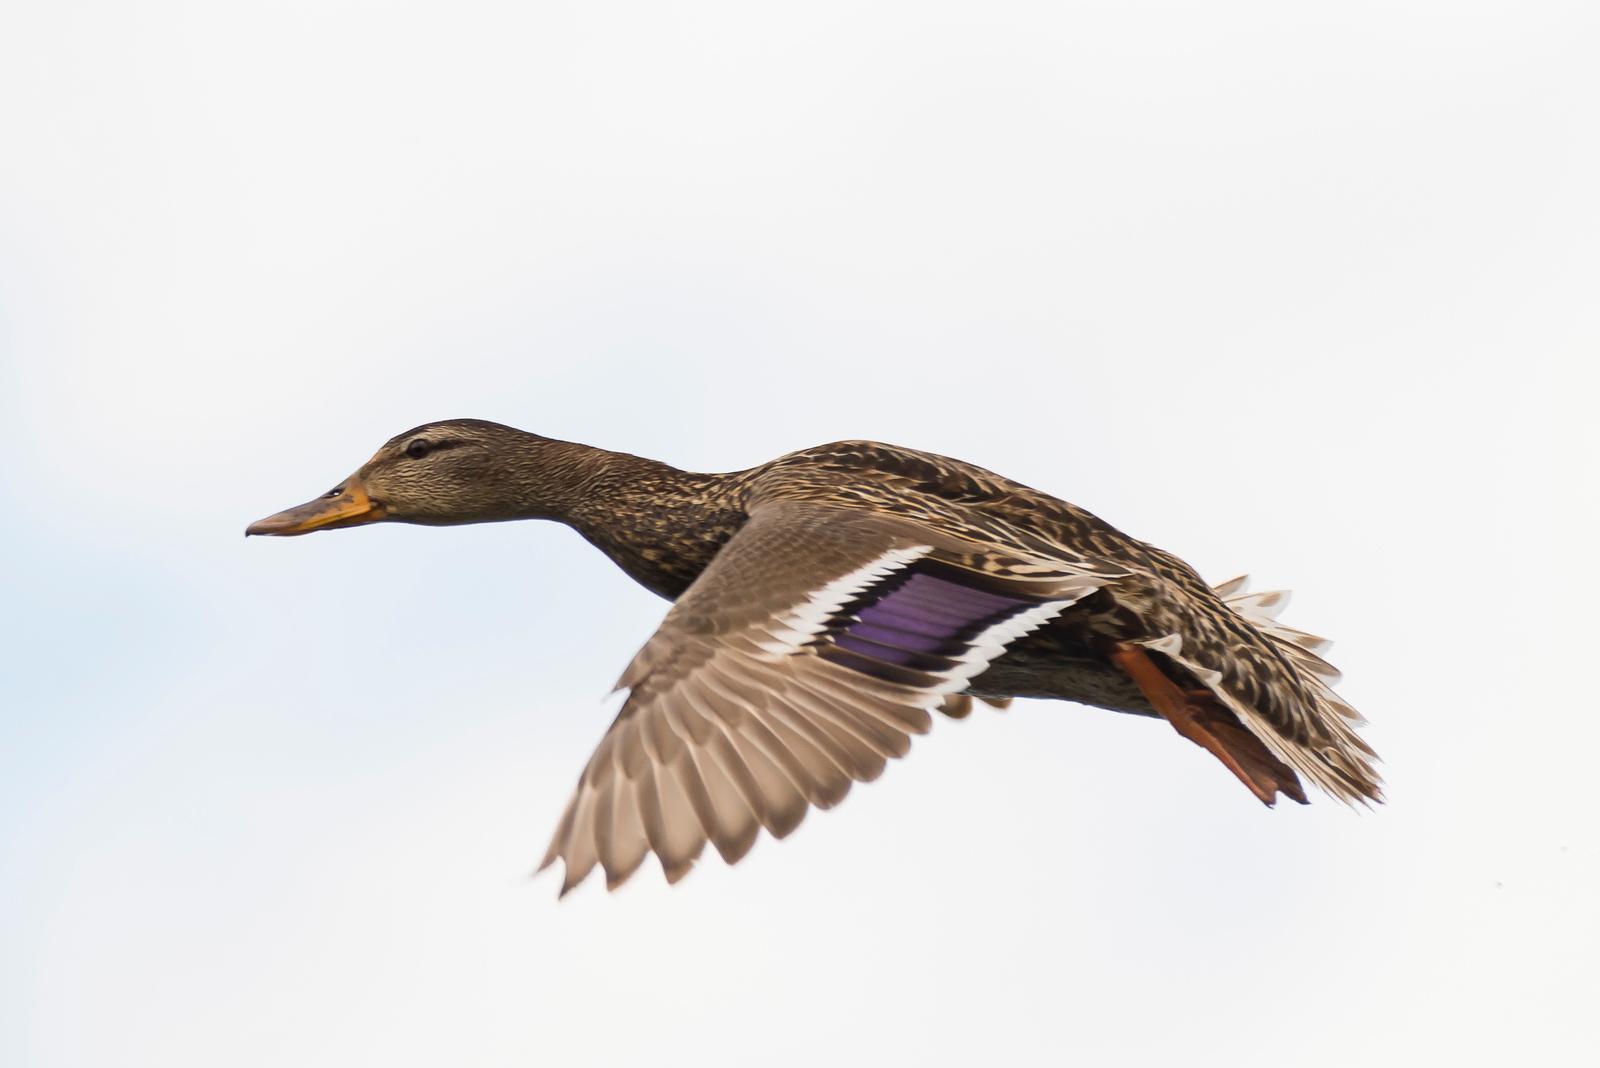 ♀ Mallard Duck in Flight